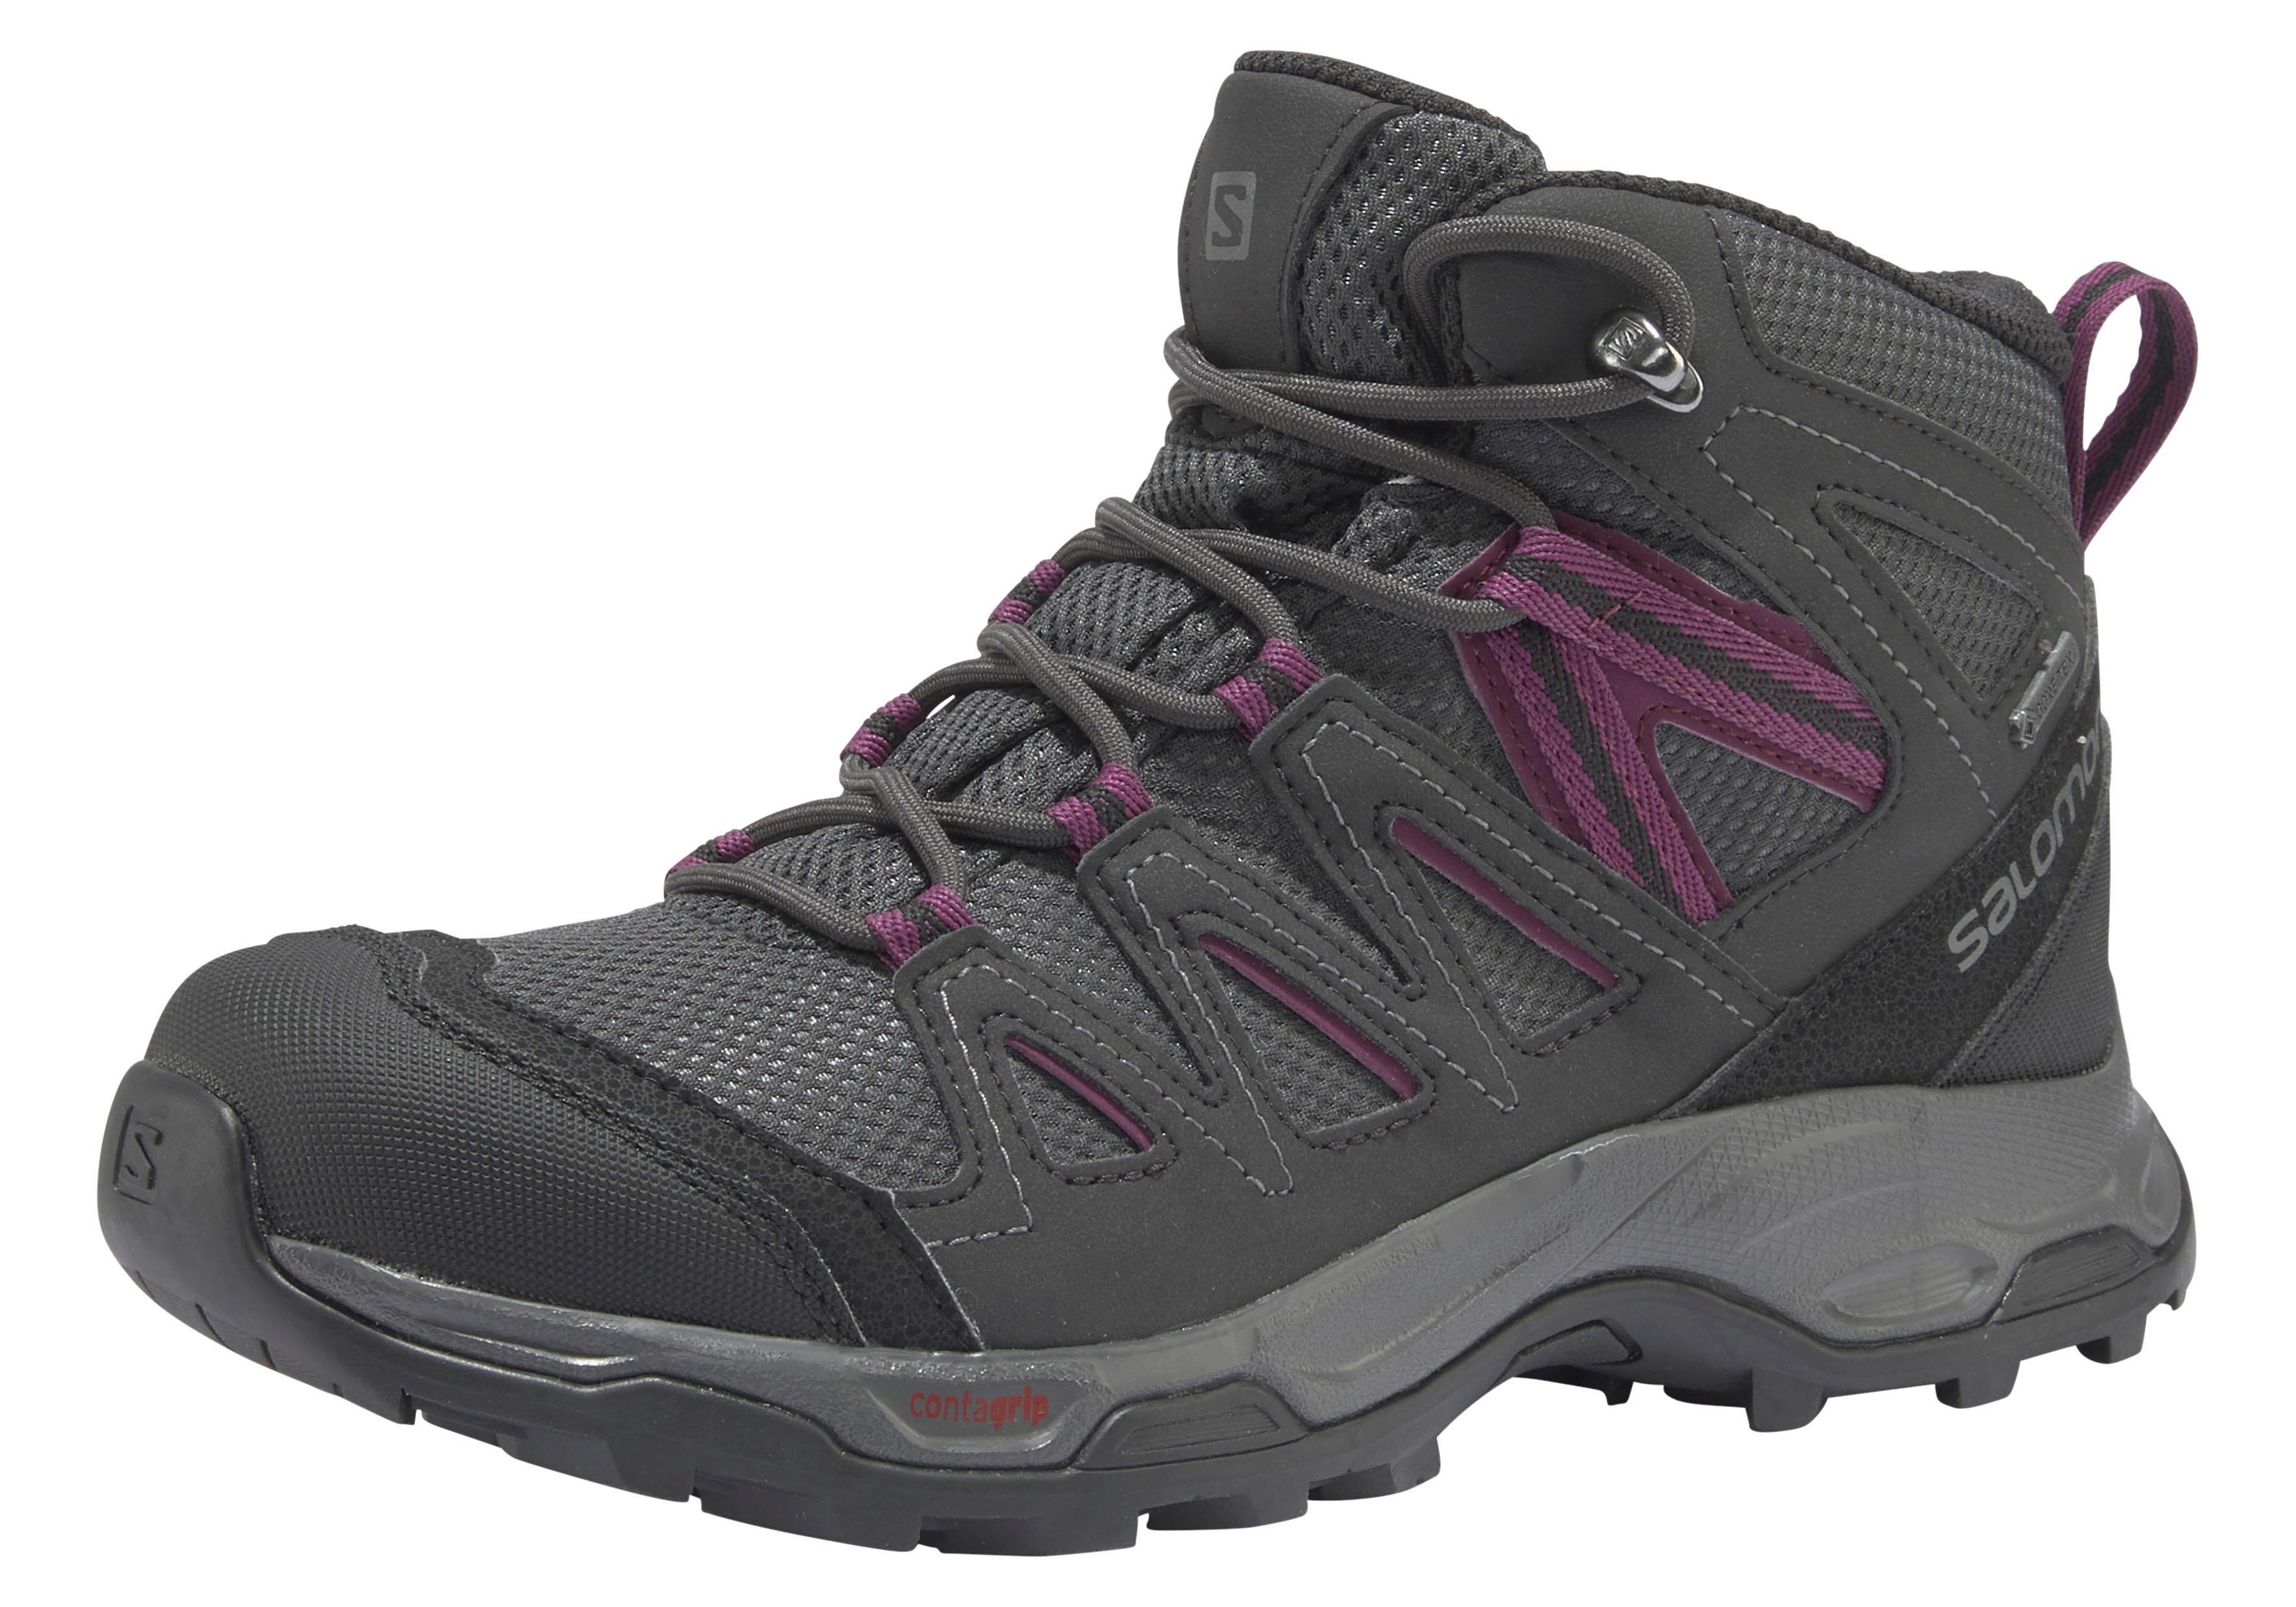 45b32d9eaaa Salomon outdoorschoenen »Hillrock Mid Gore-Tex®« online shop | OTTO